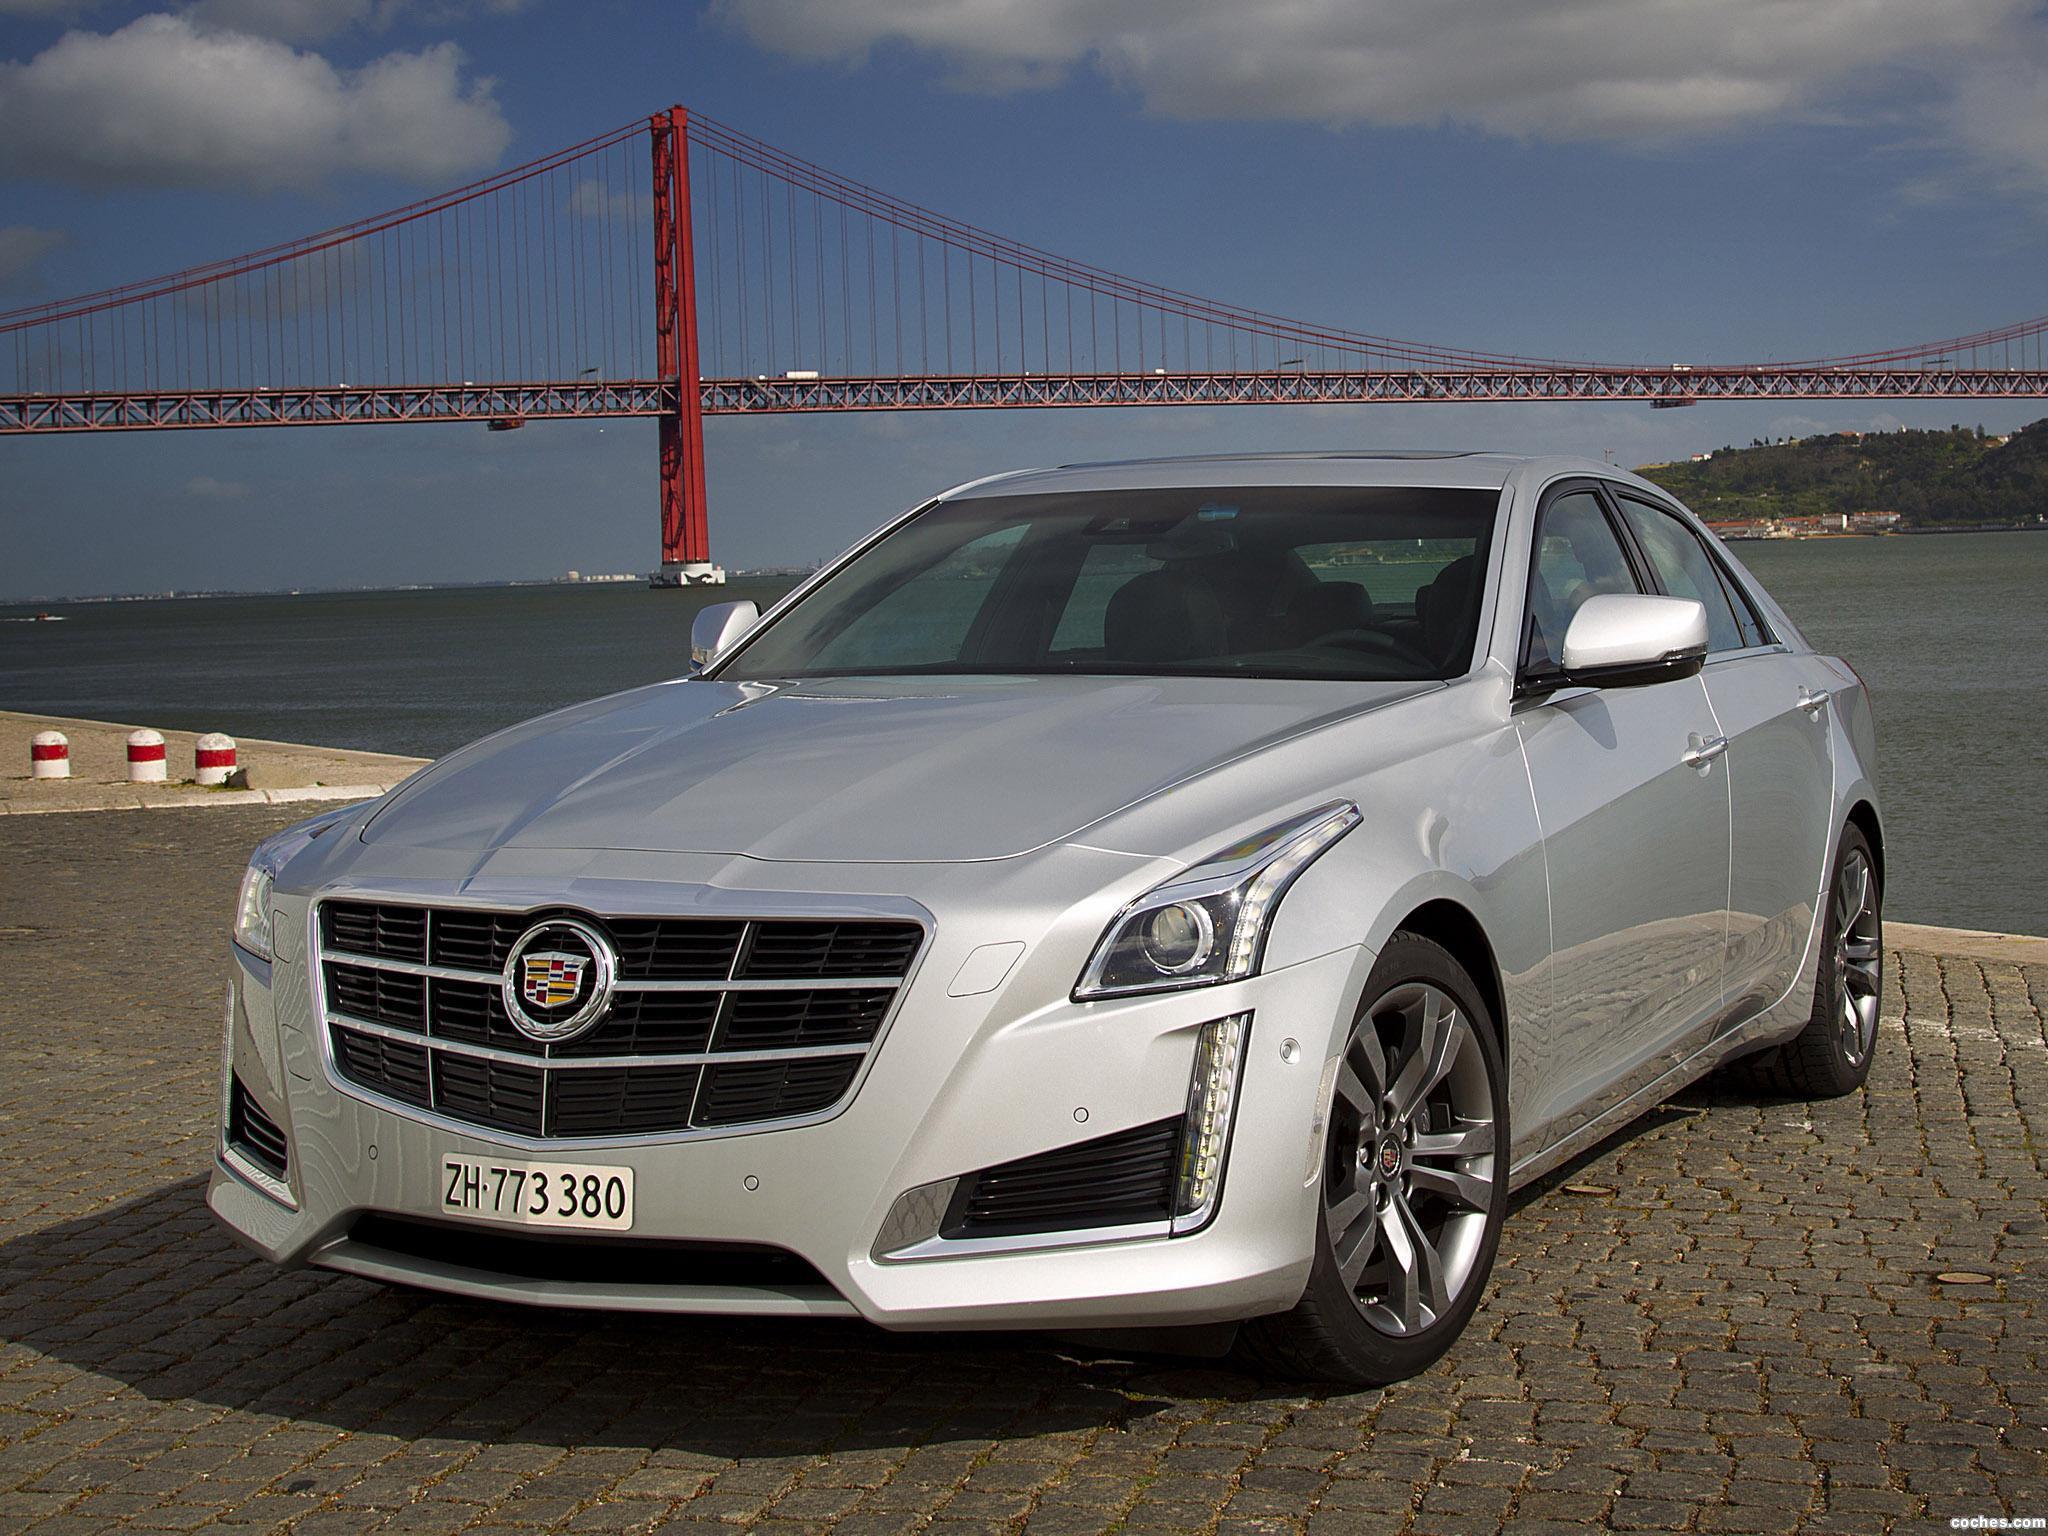 Foto 11 de Cadillac CTS Europe 2014